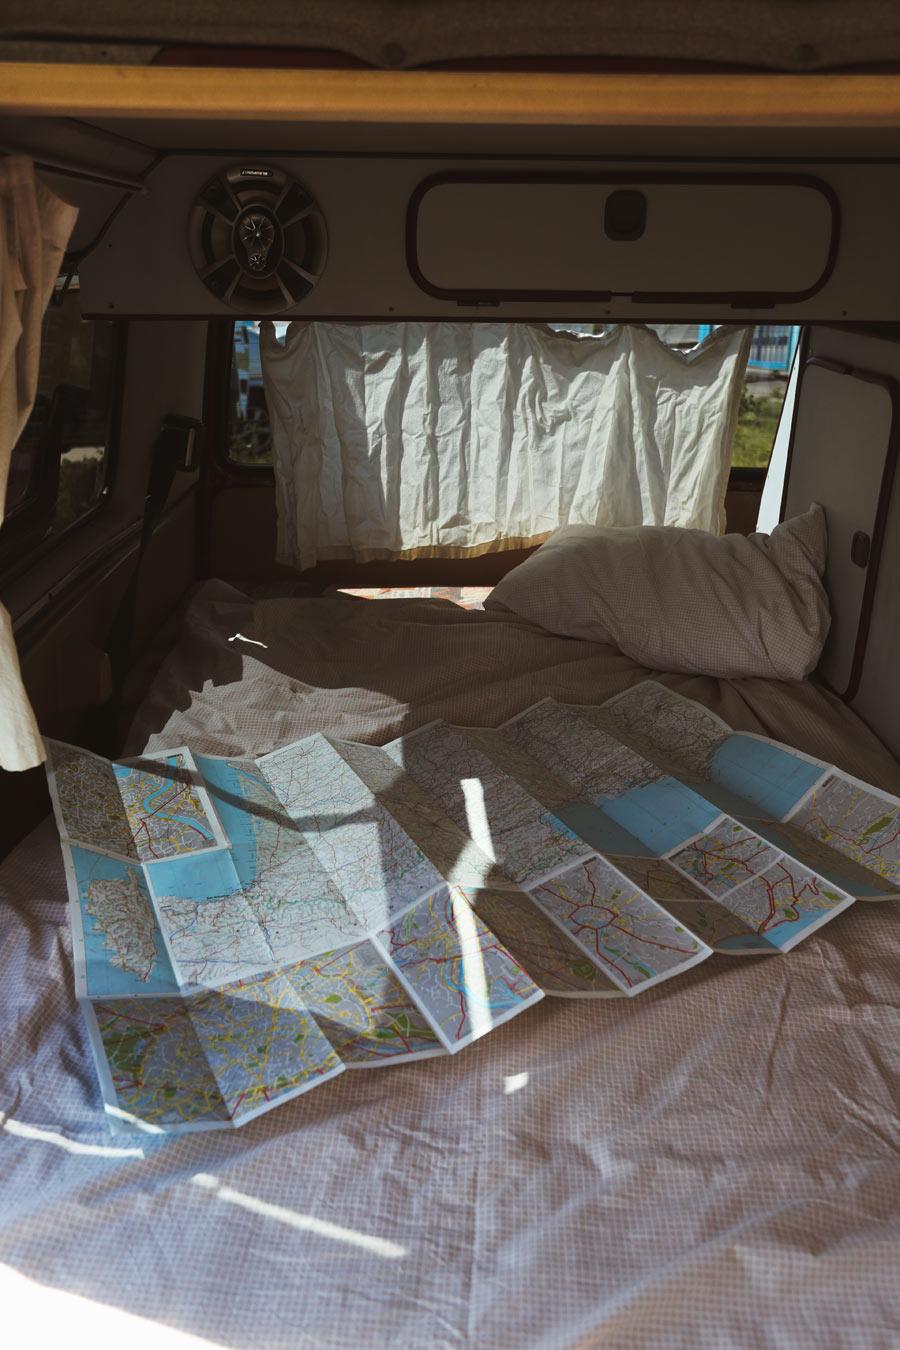 BulliHoliday Campingbus mieten Janine - unteres Bett mit ausgebreiteter Landkarte